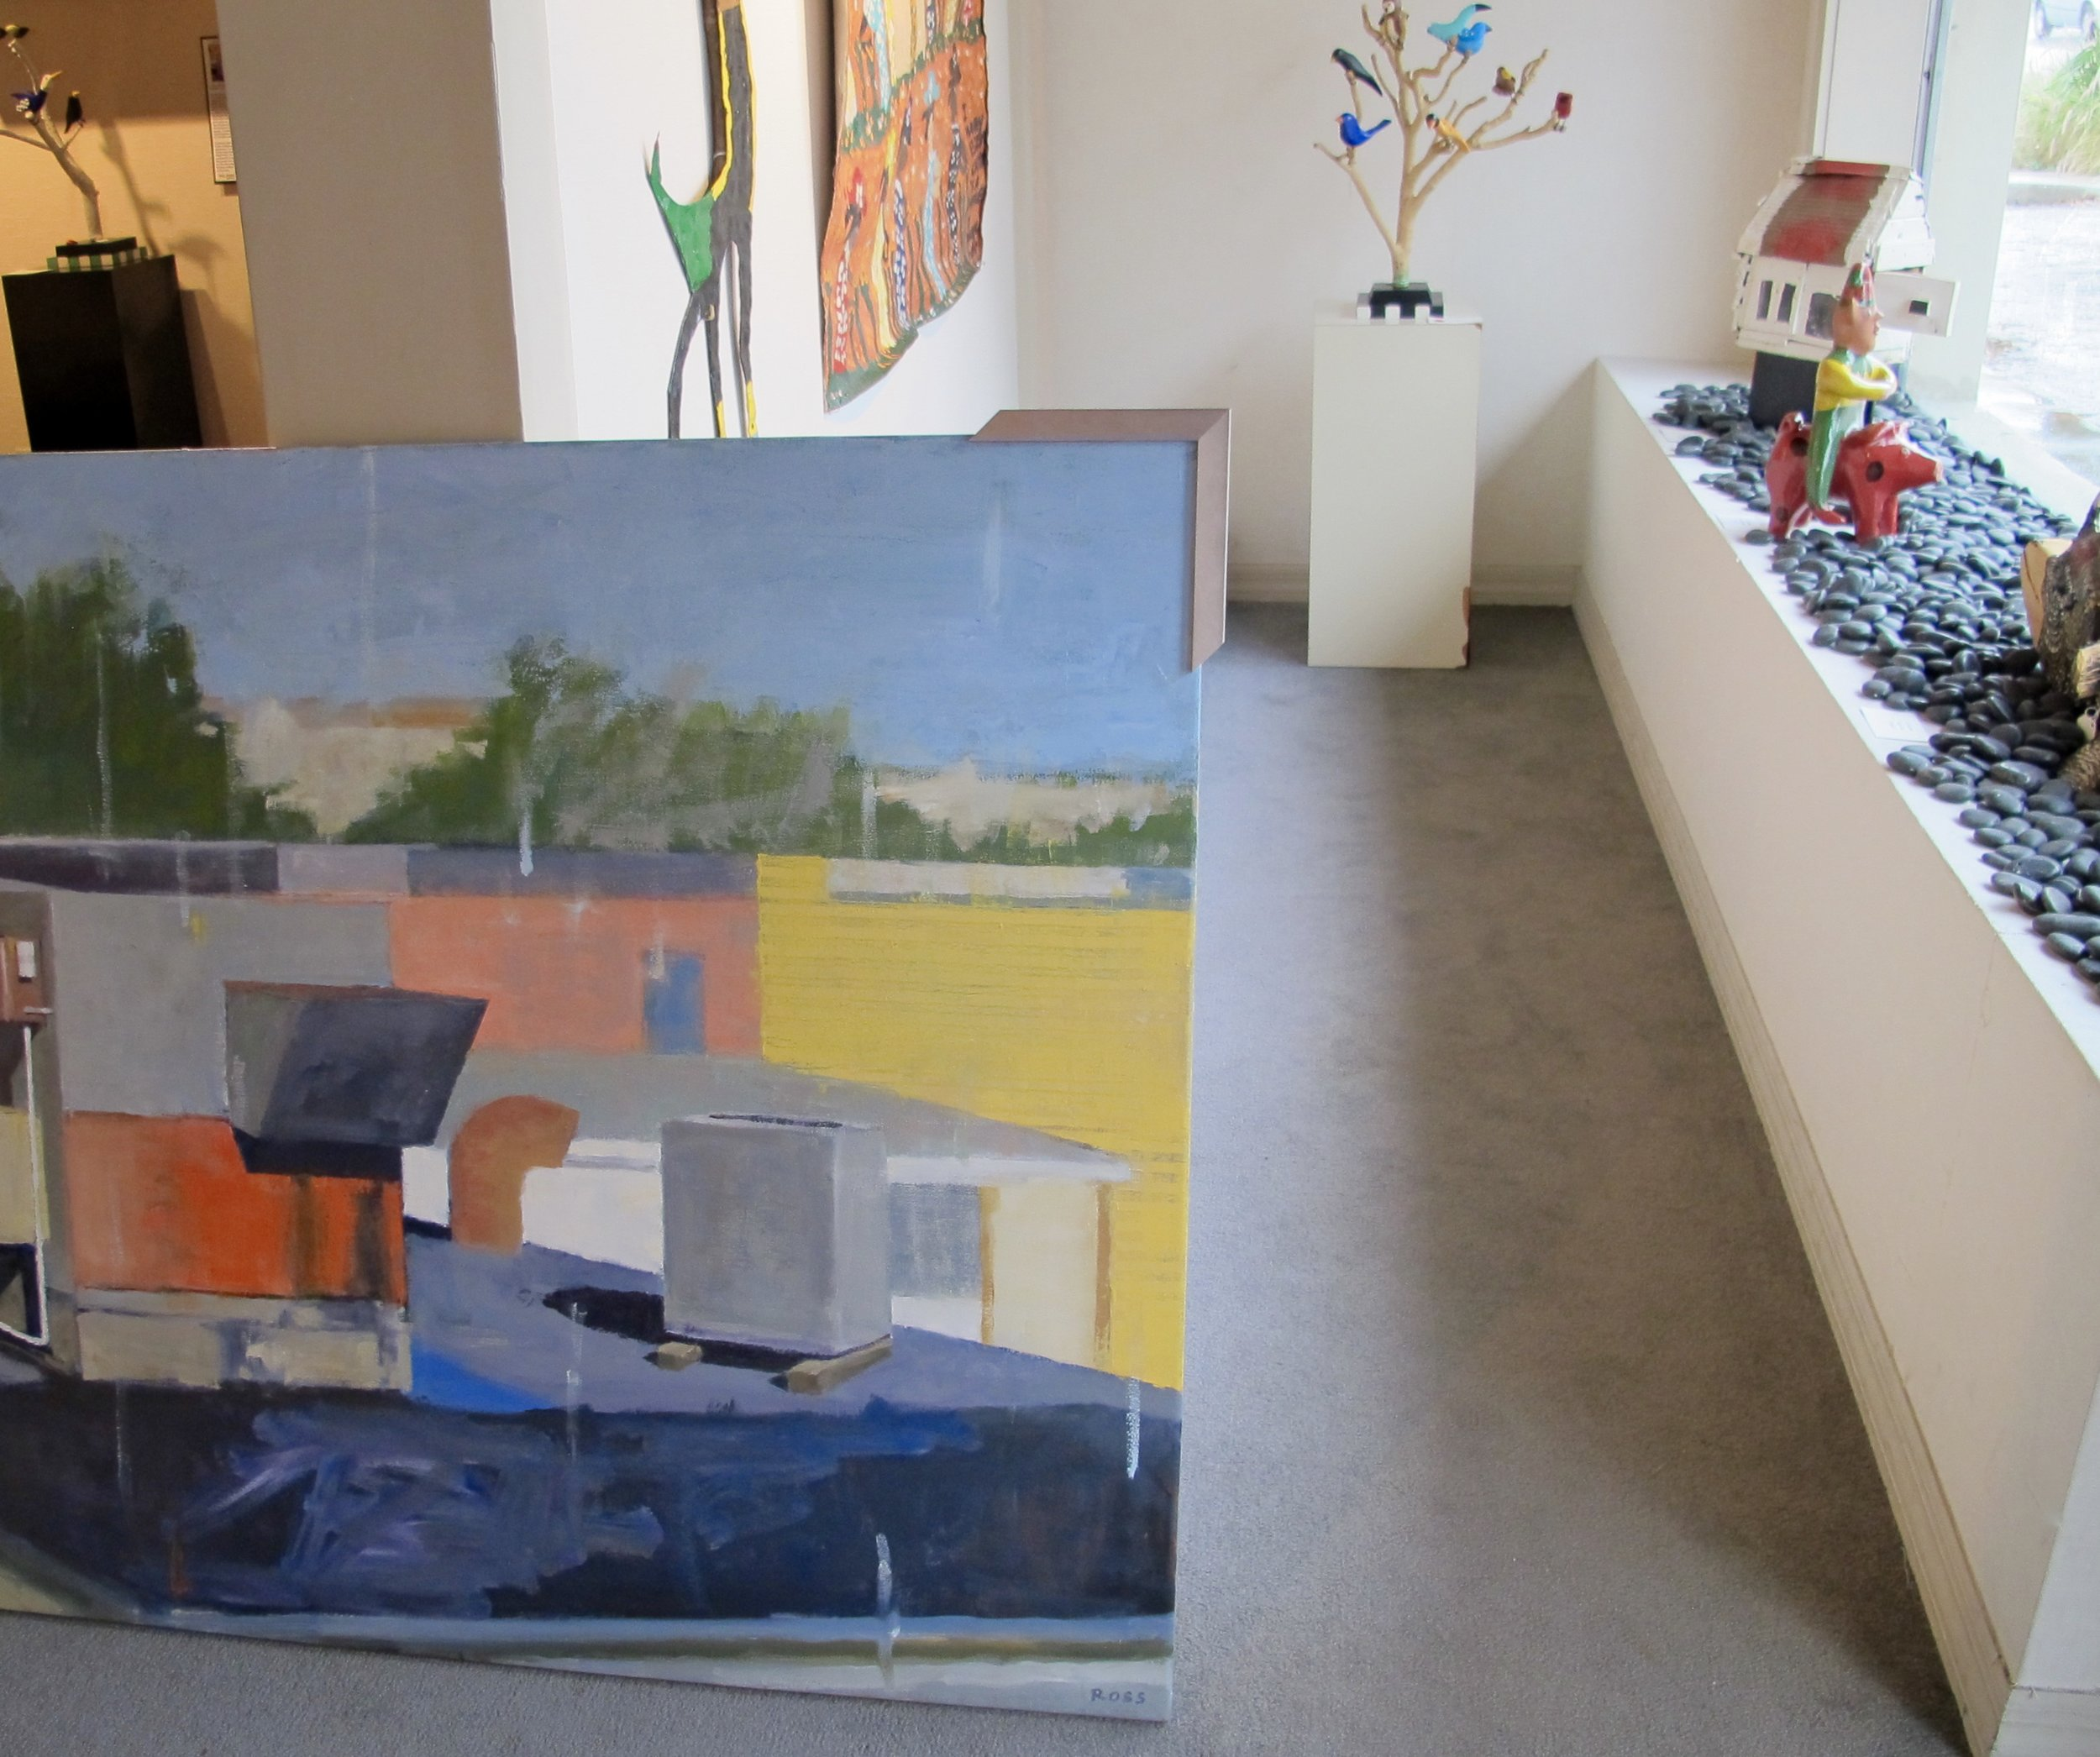 Art selection for Shumaker, Loop & Kendrick